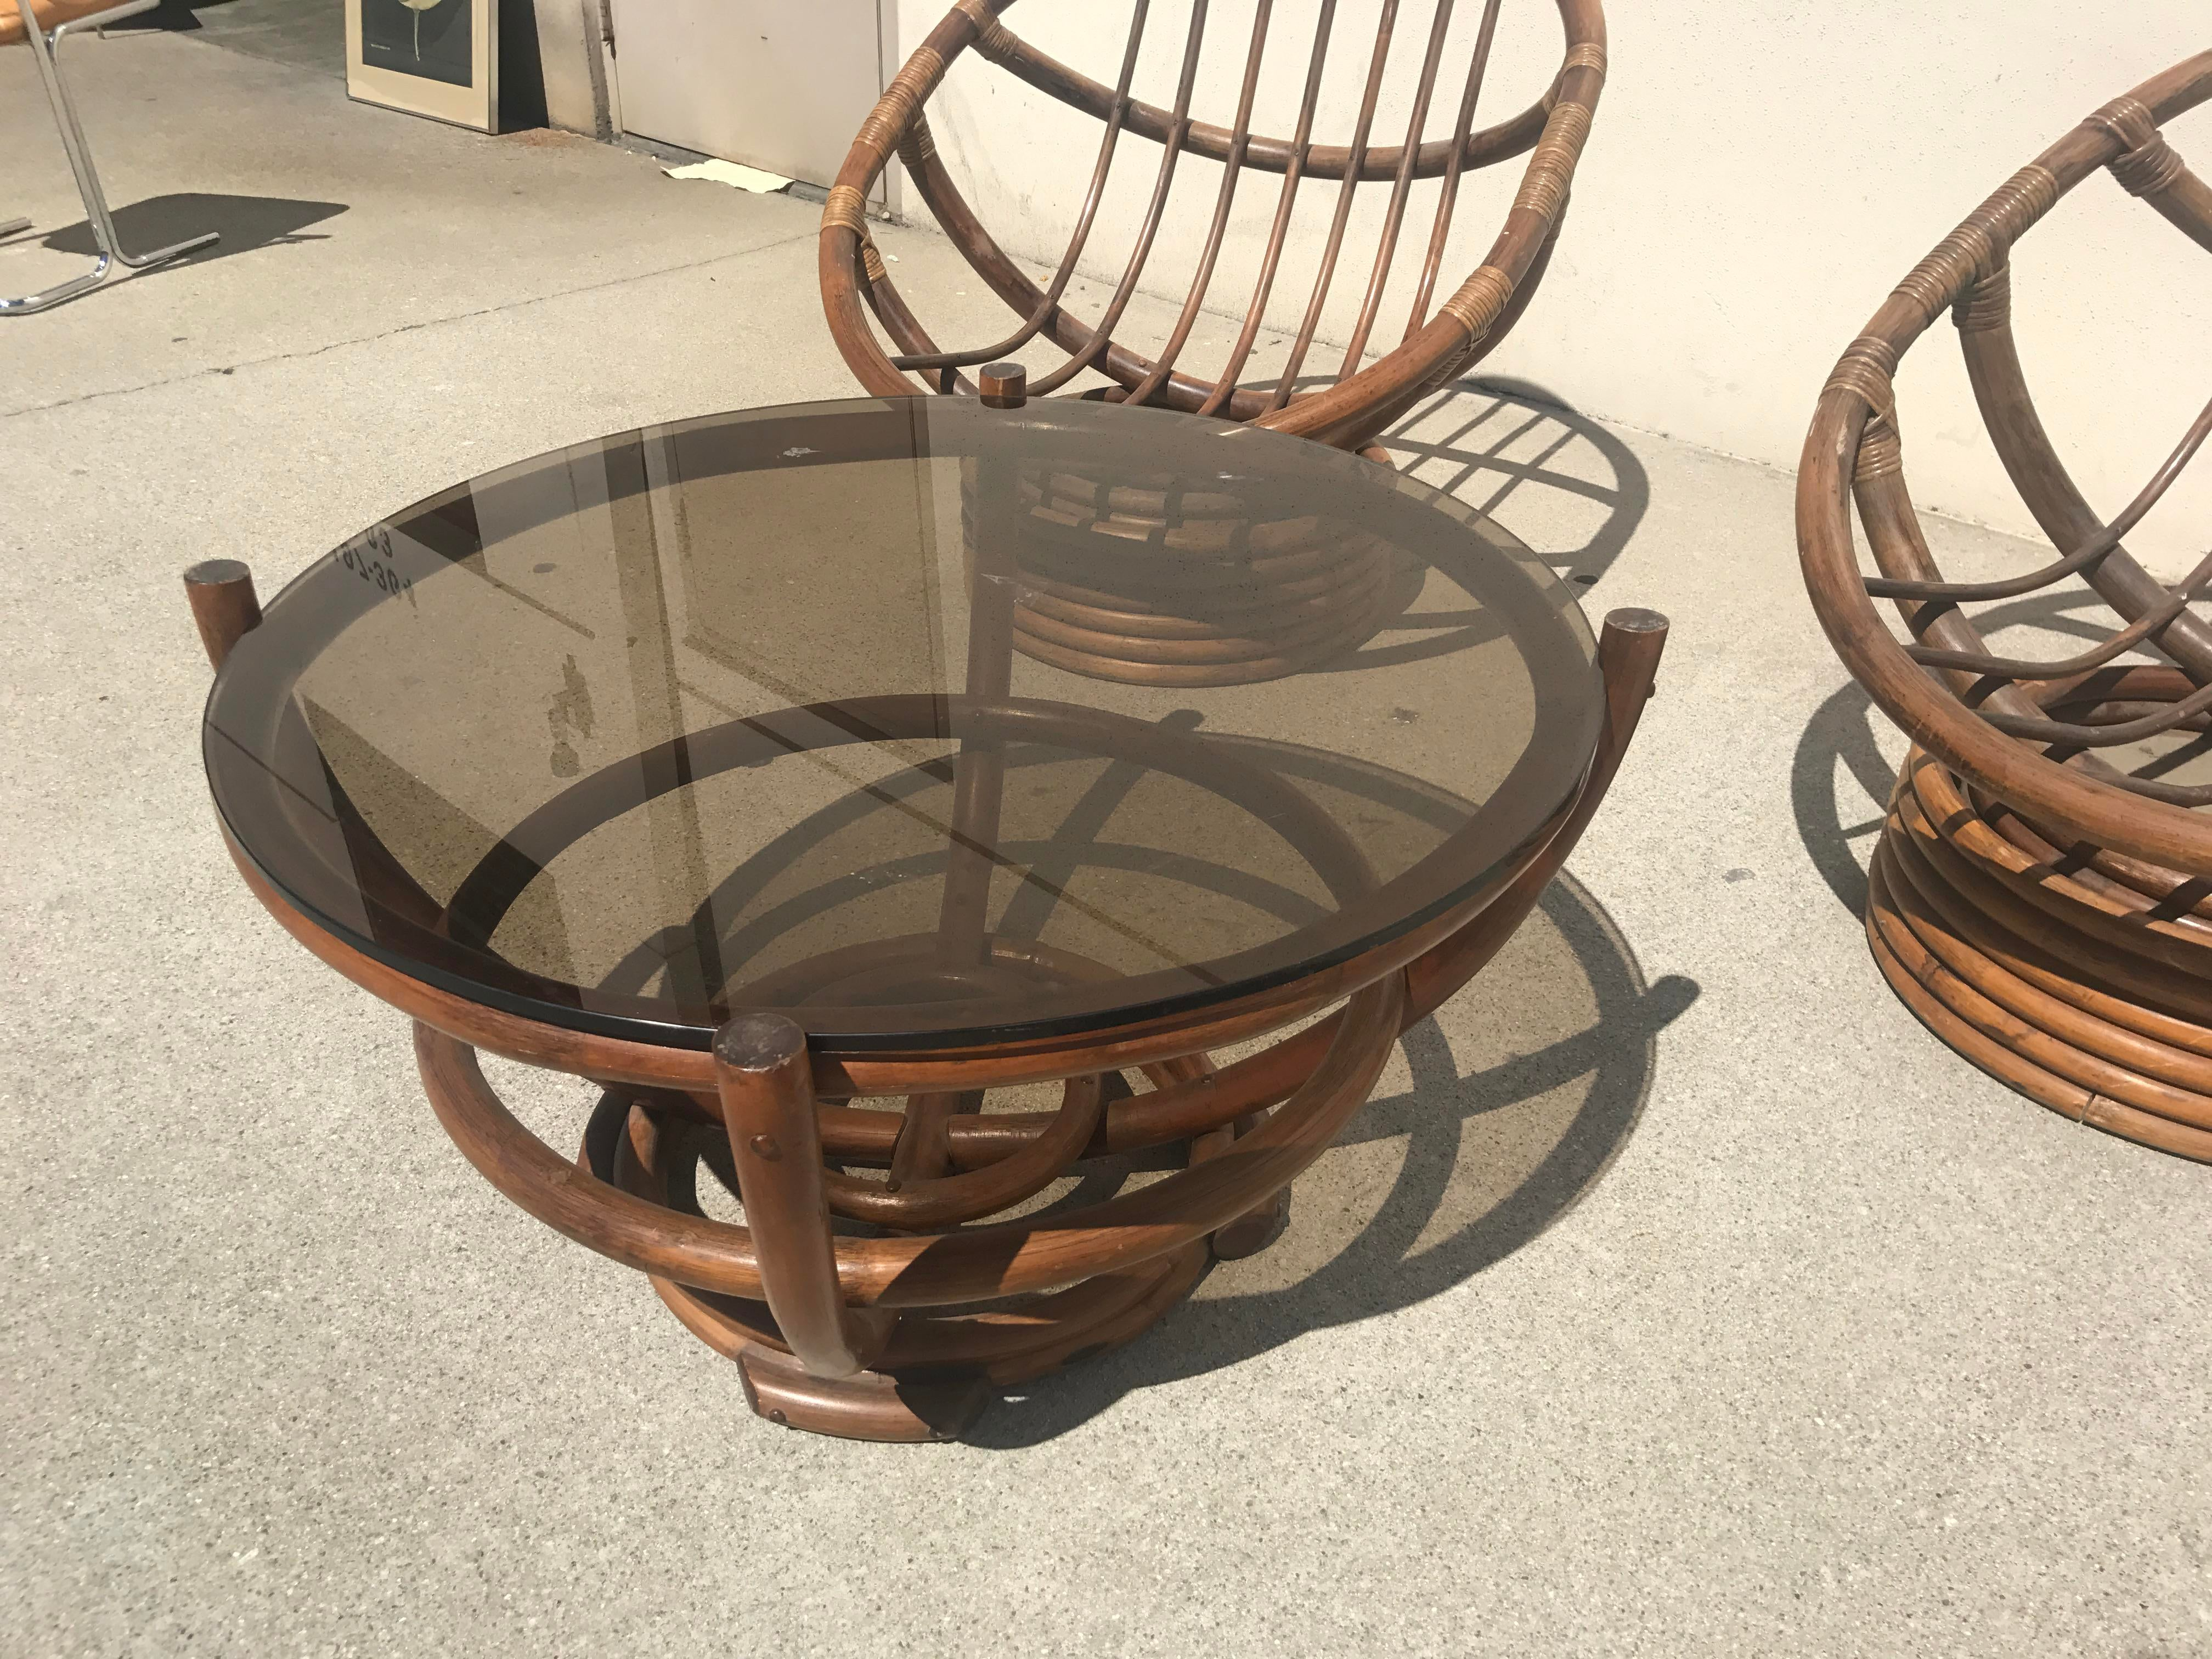 Vintage 60s Rattan Papasan Swivel Rocking Chairs U0026 Table   Set Of 3 For  Sale